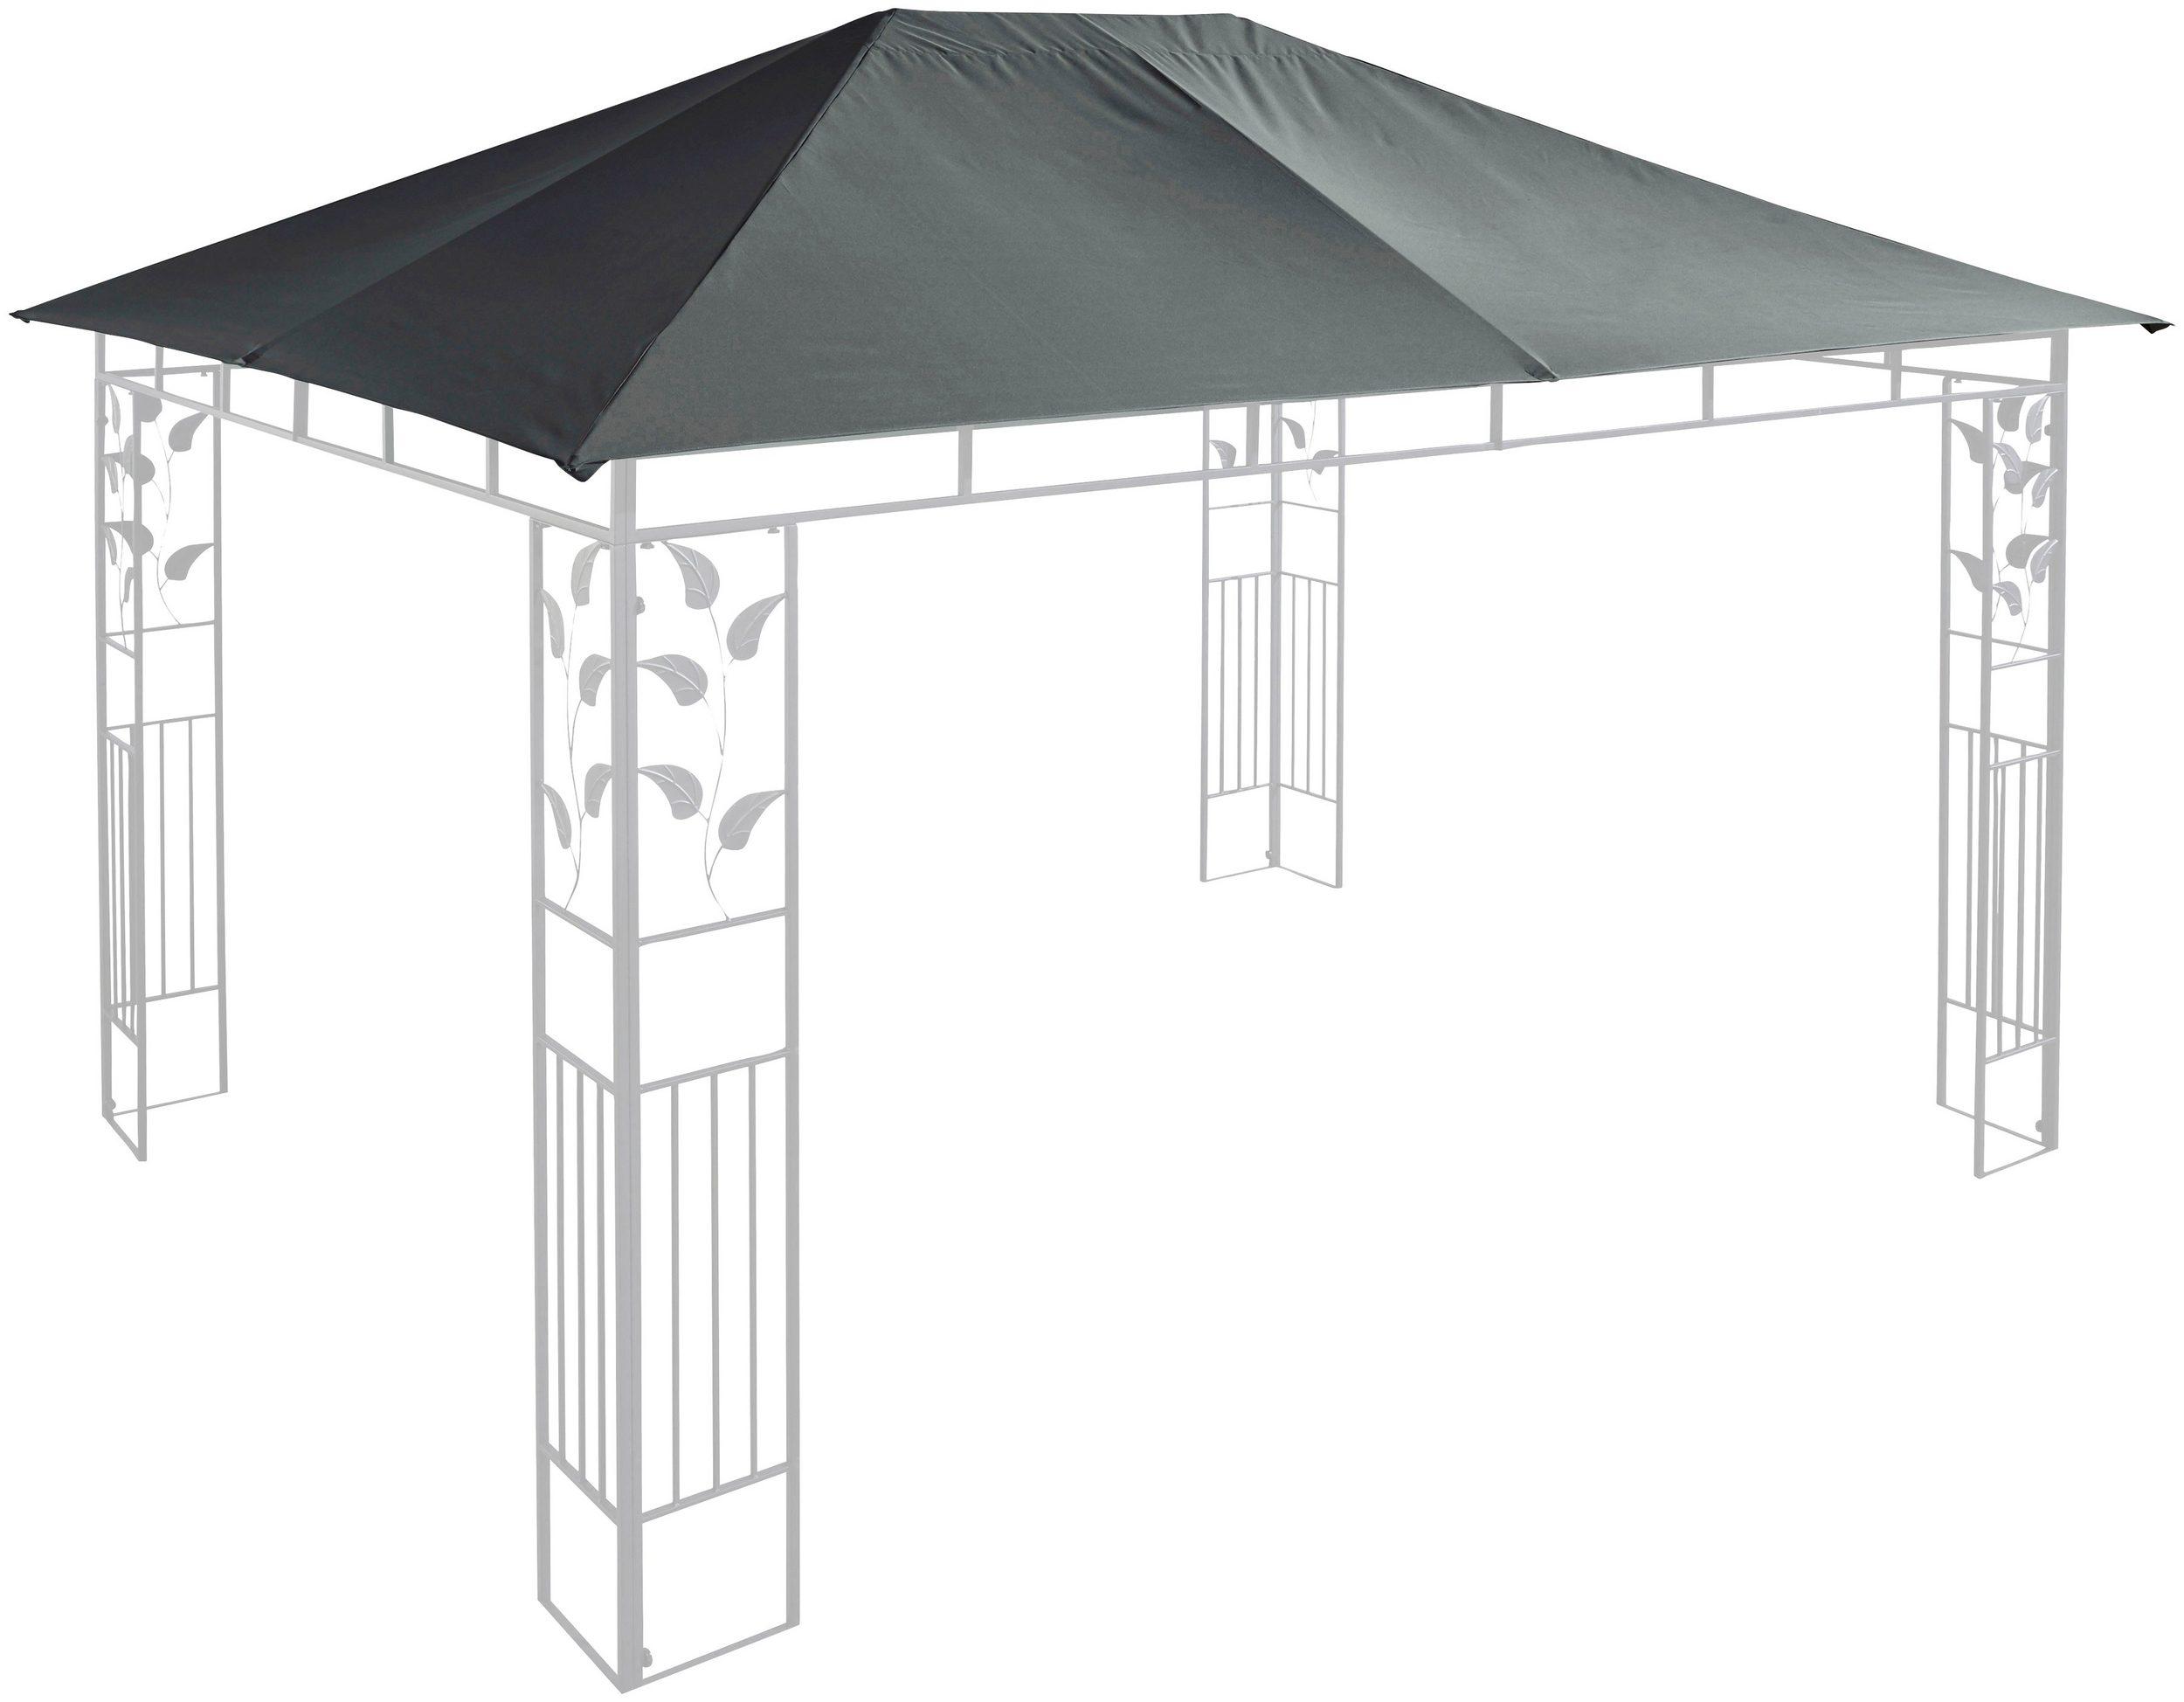 ersatzdach dach f r pavillon 3 m anthrazit pu beschichtung 7220184 ebay. Black Bedroom Furniture Sets. Home Design Ideas